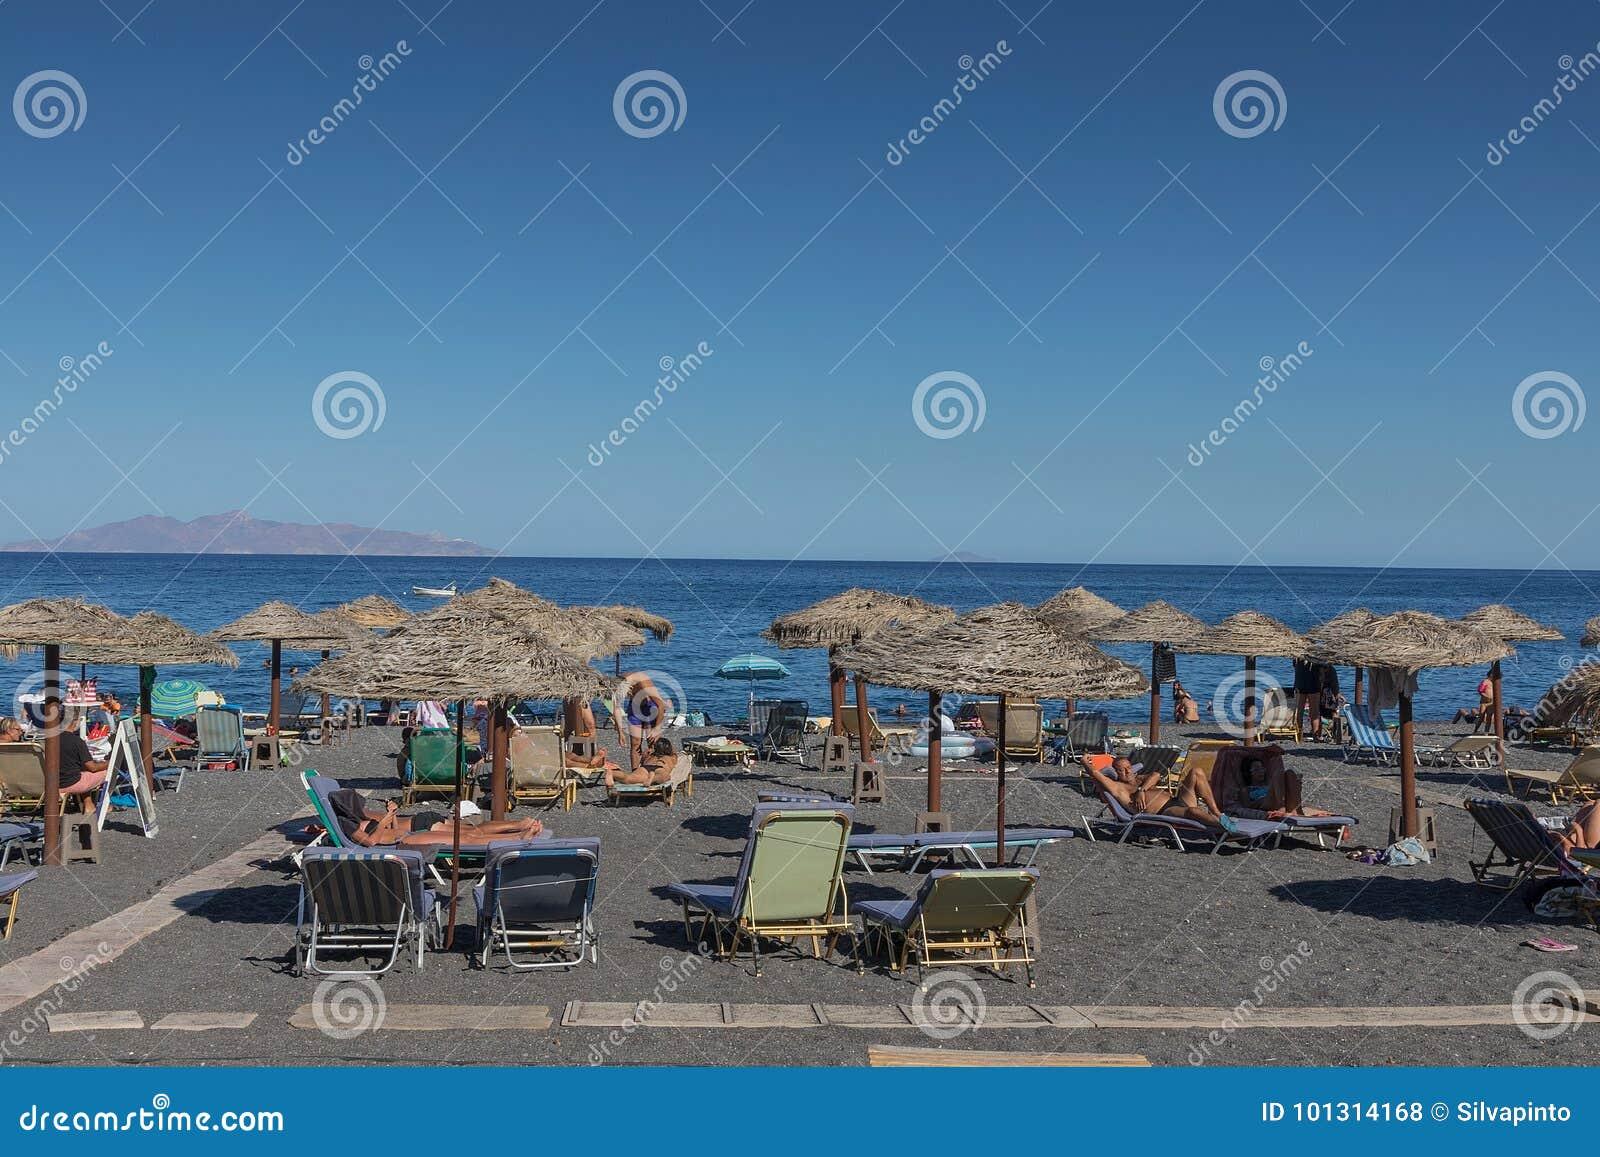 SANTORINI/GREECE 5 septembre - plage de Kamari dans Santorini, Grèce